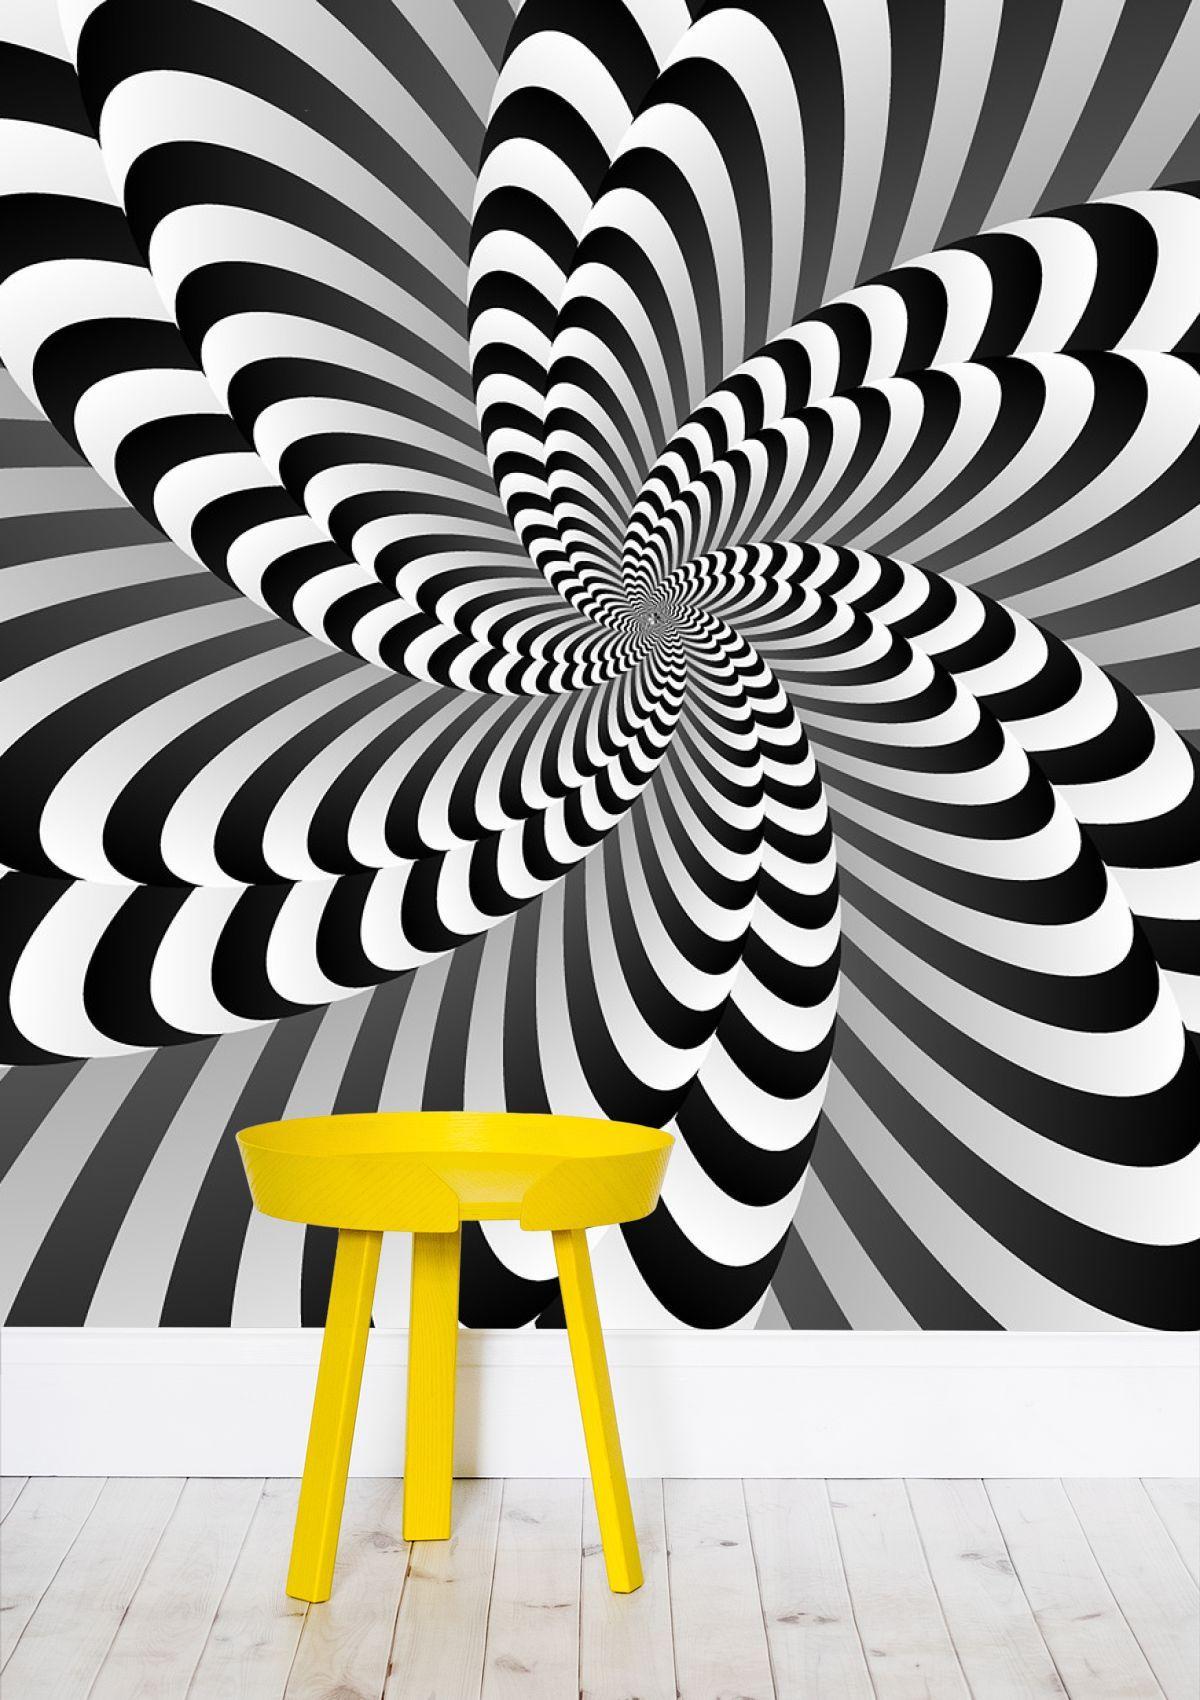 Black white optical illusion wallpaper by rizwana khan rizwanakhan from 53 50 per m² mipic